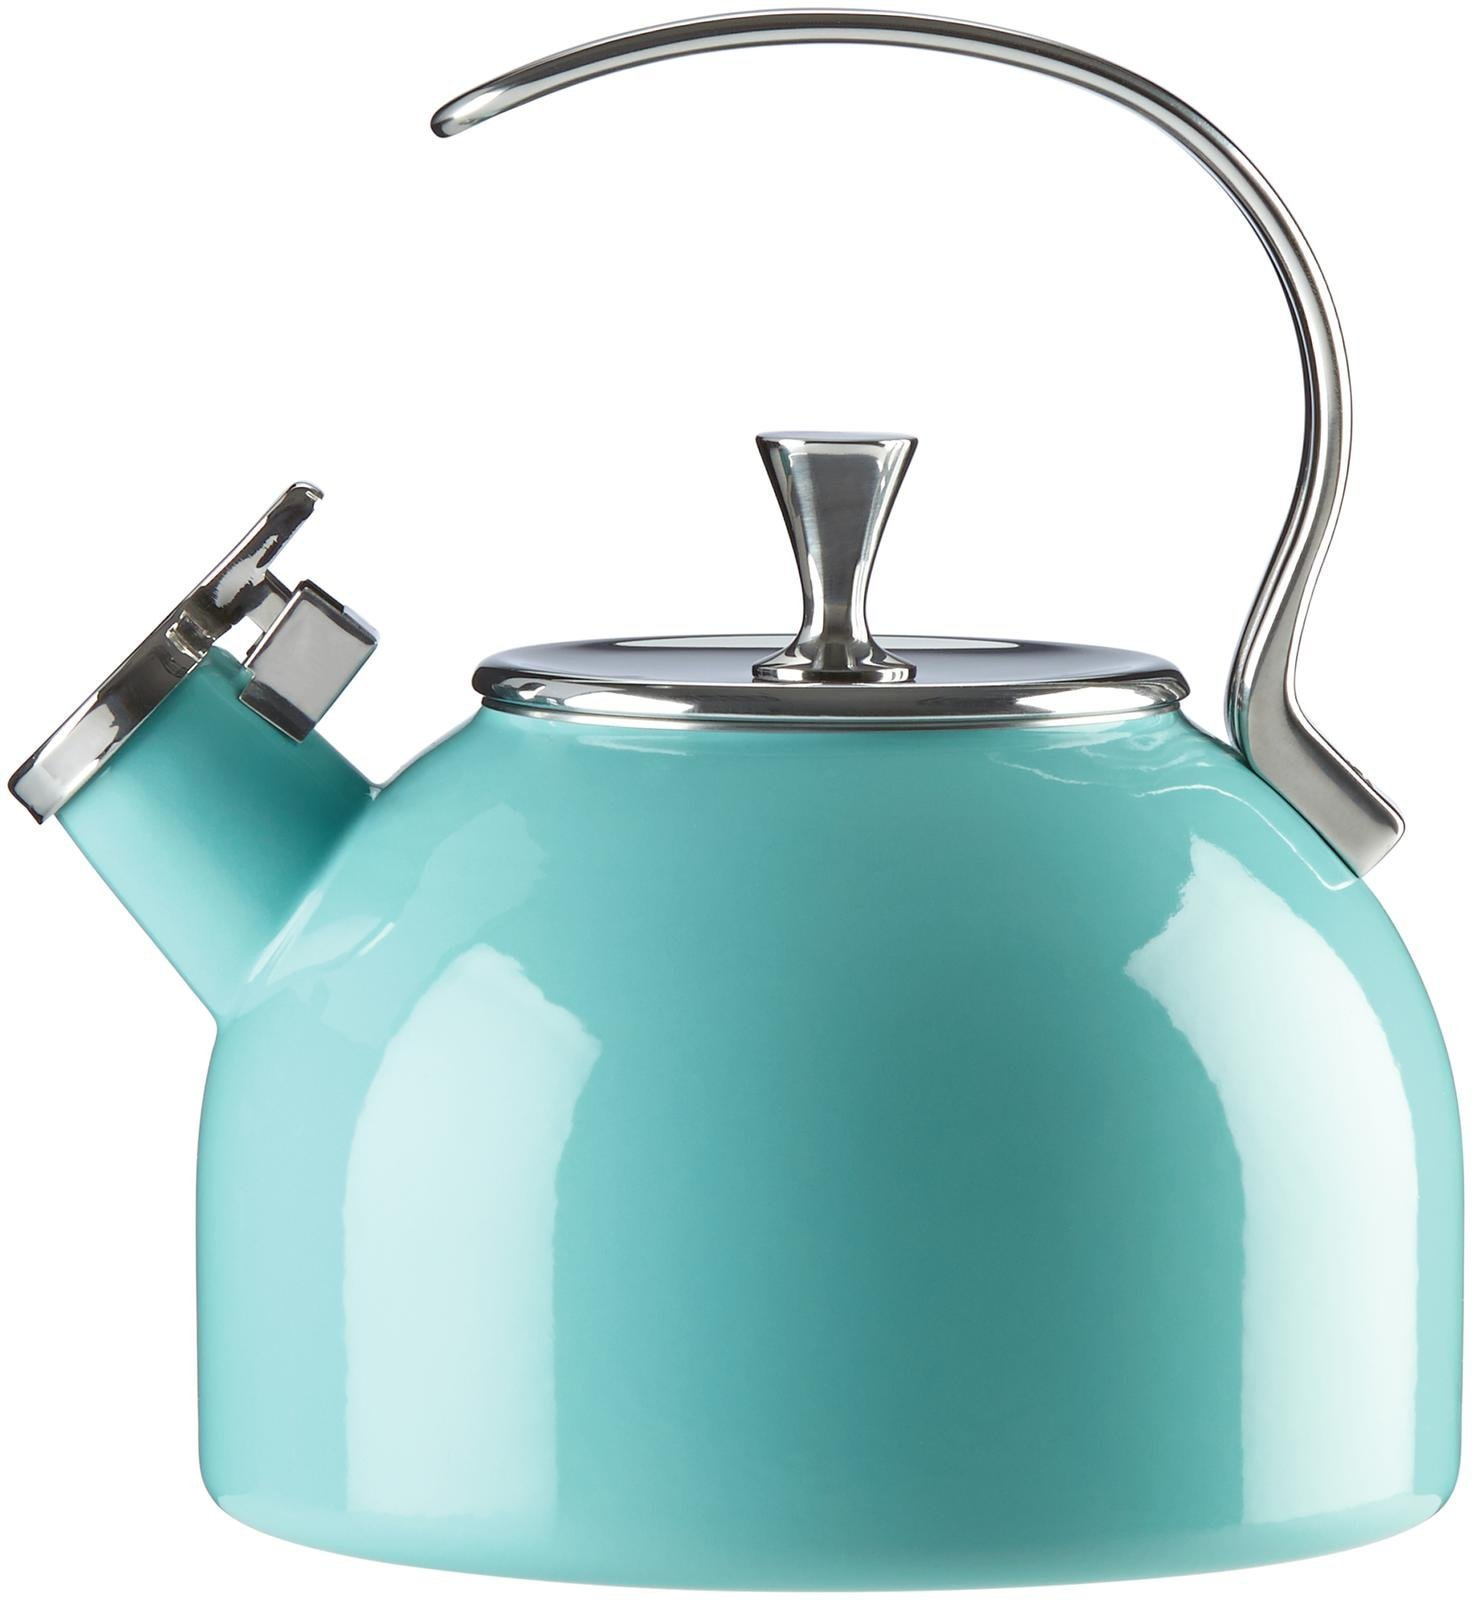 Kate Spade New York 857005 Turo Tea Kettle, Turquoise by Kate Spade New York